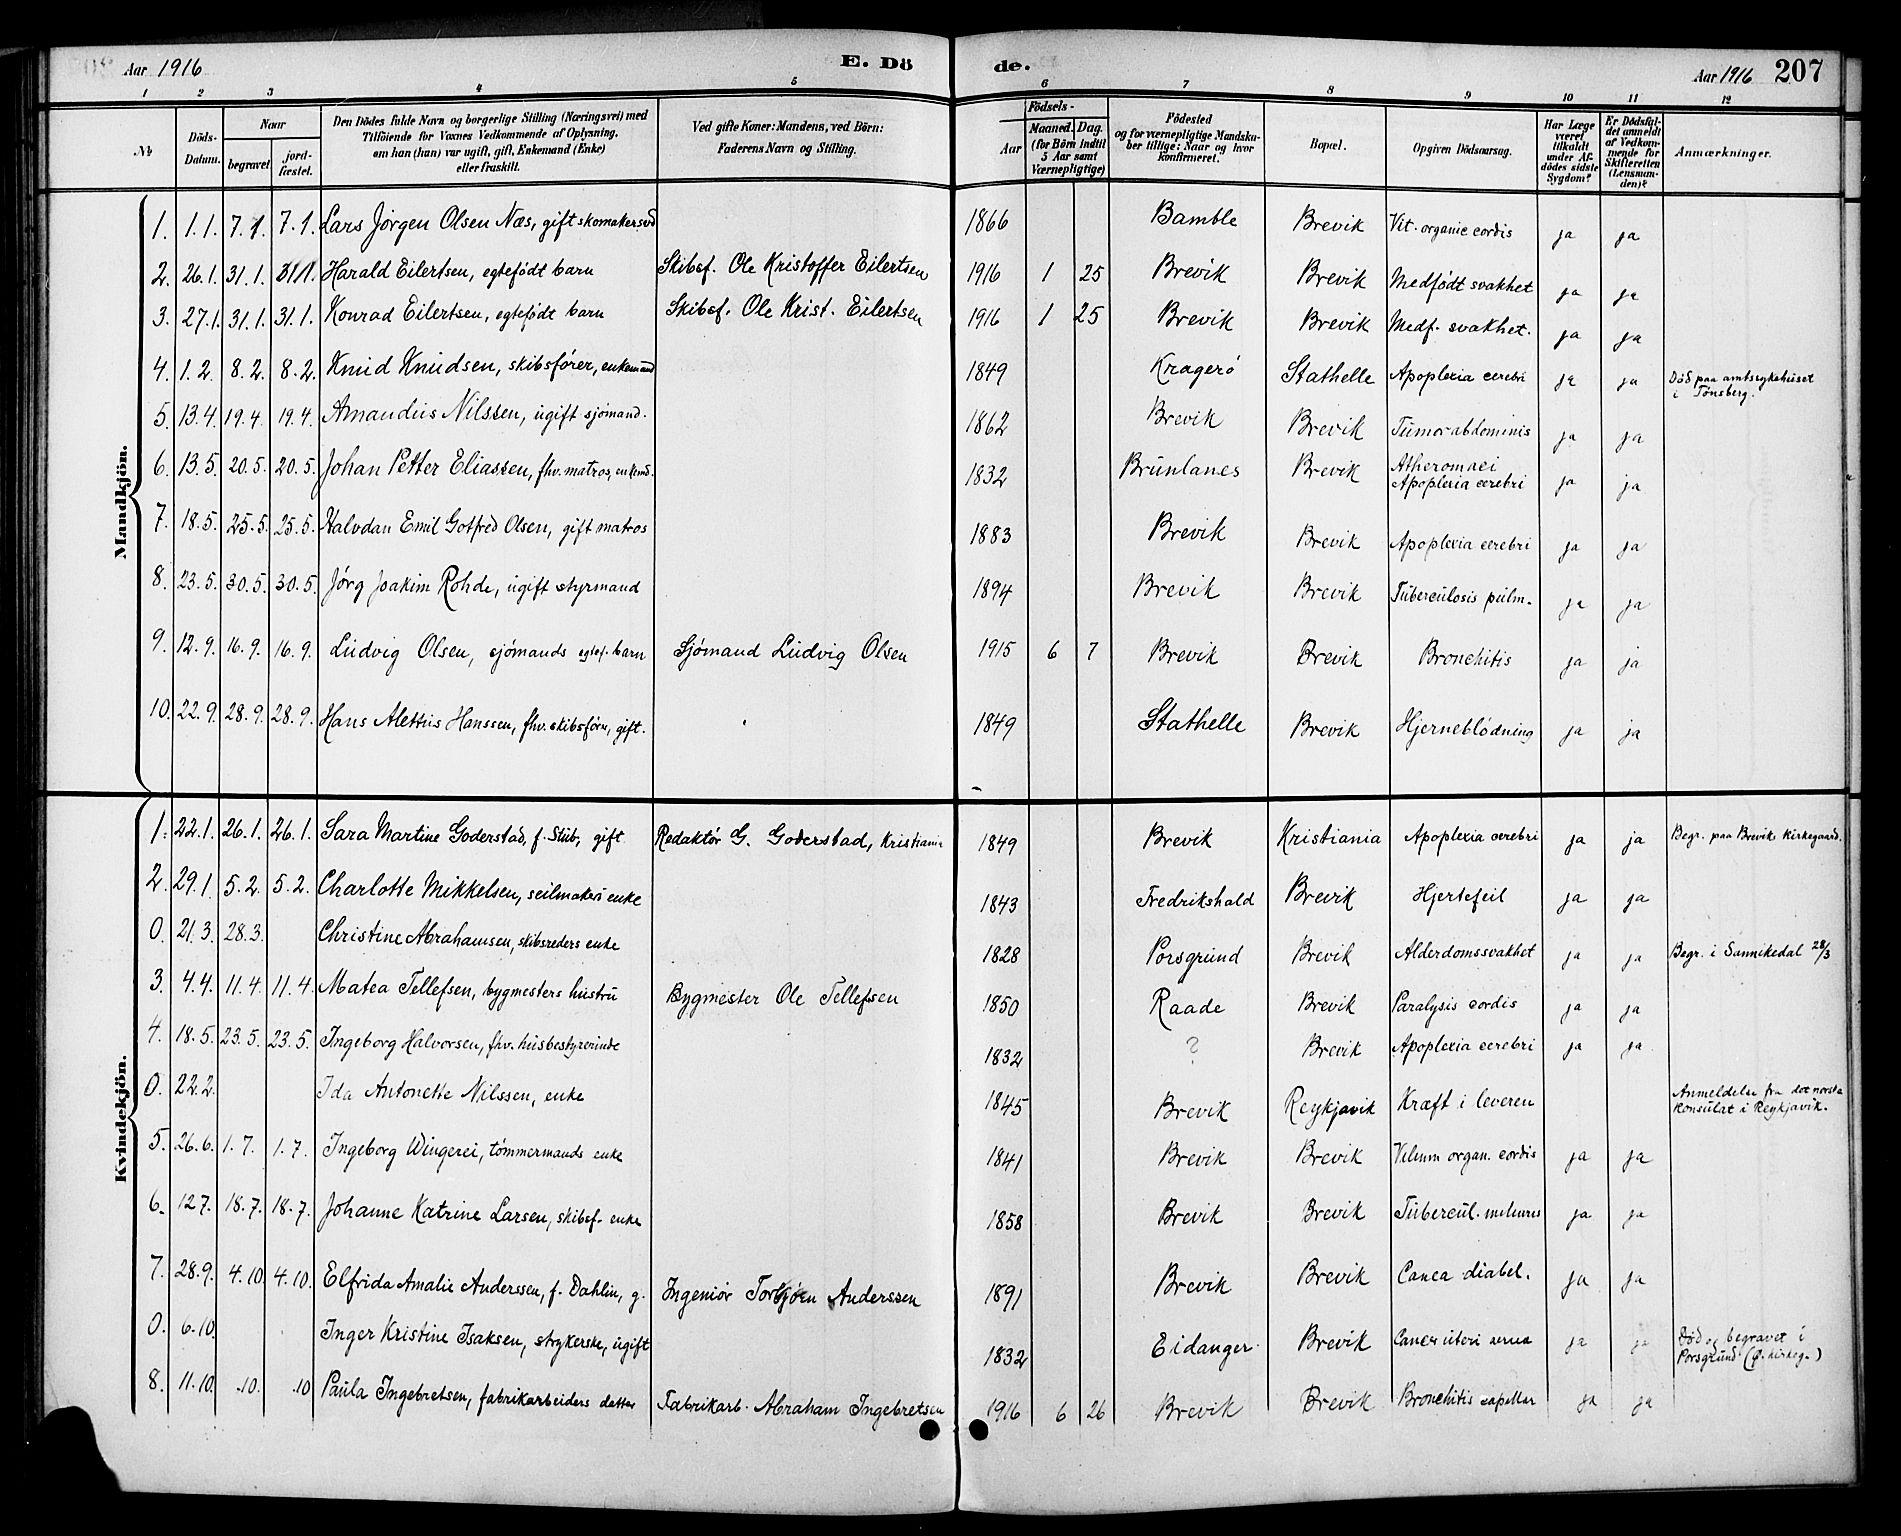 SAKO, Brevik kirkebøker, G/Ga/L0005: Klokkerbok nr. 5, 1901-1924, s. 207